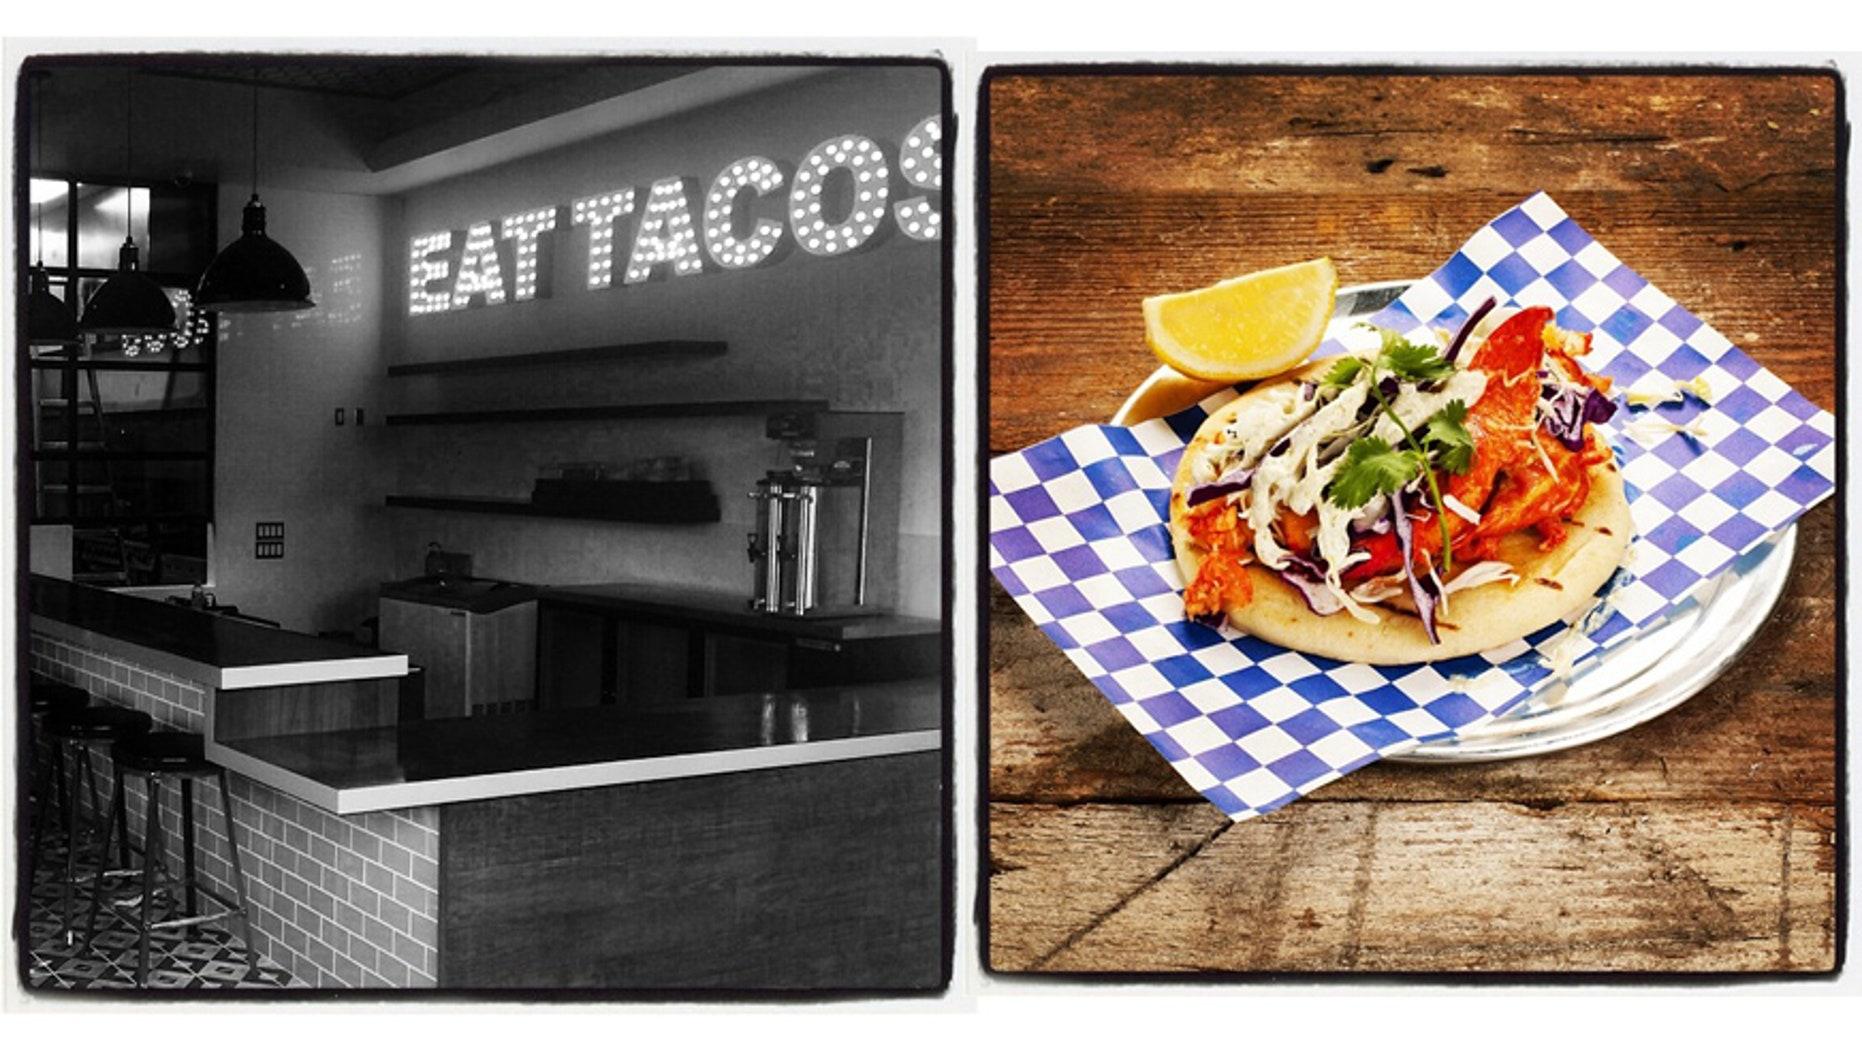 Introducing a fancier way to eat tacos.